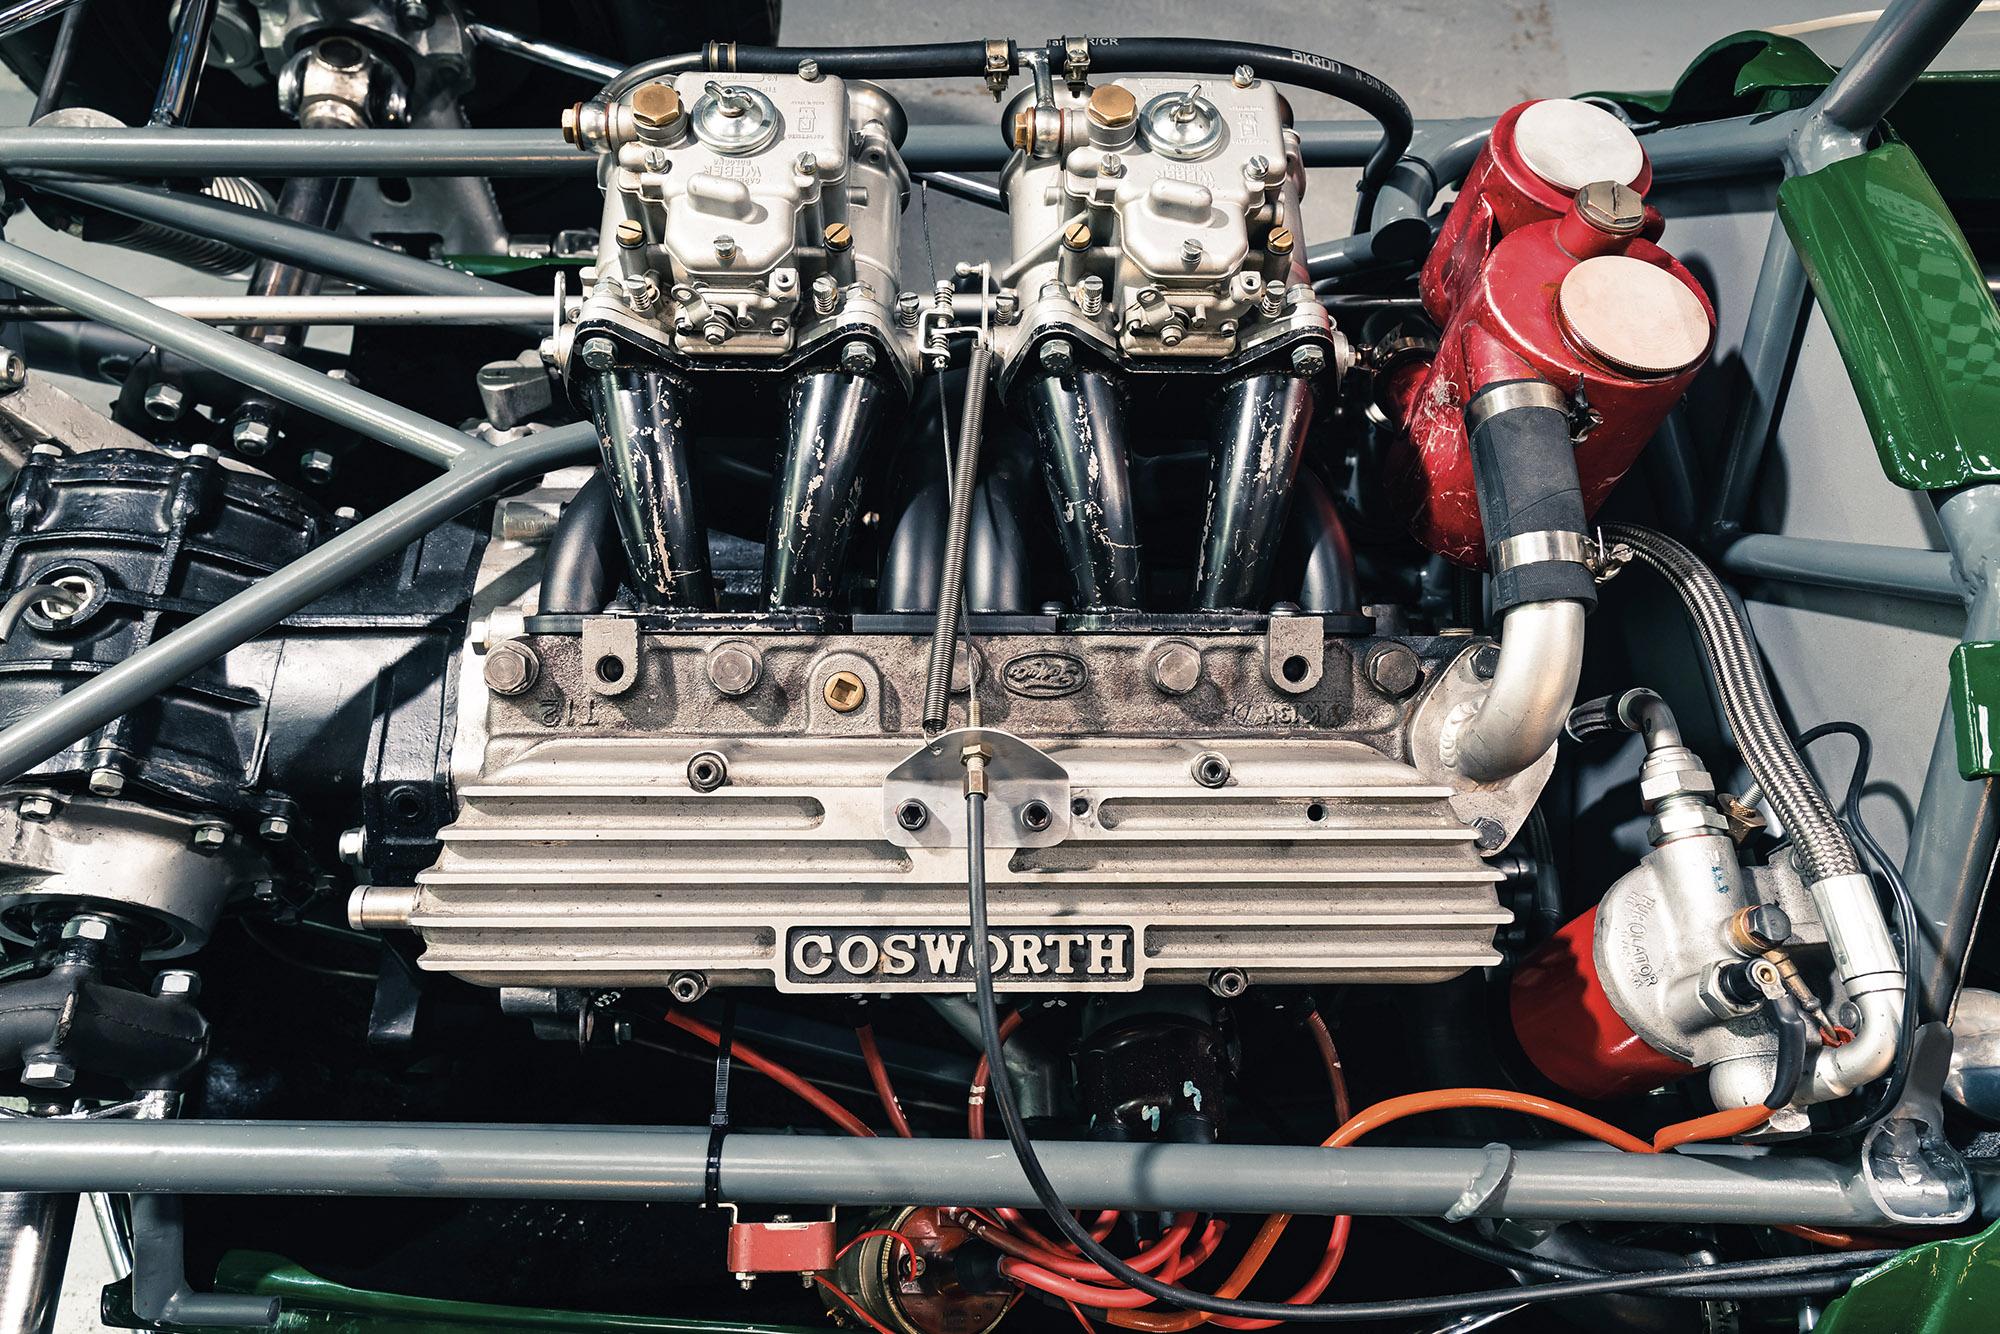 Lotus 22 engine